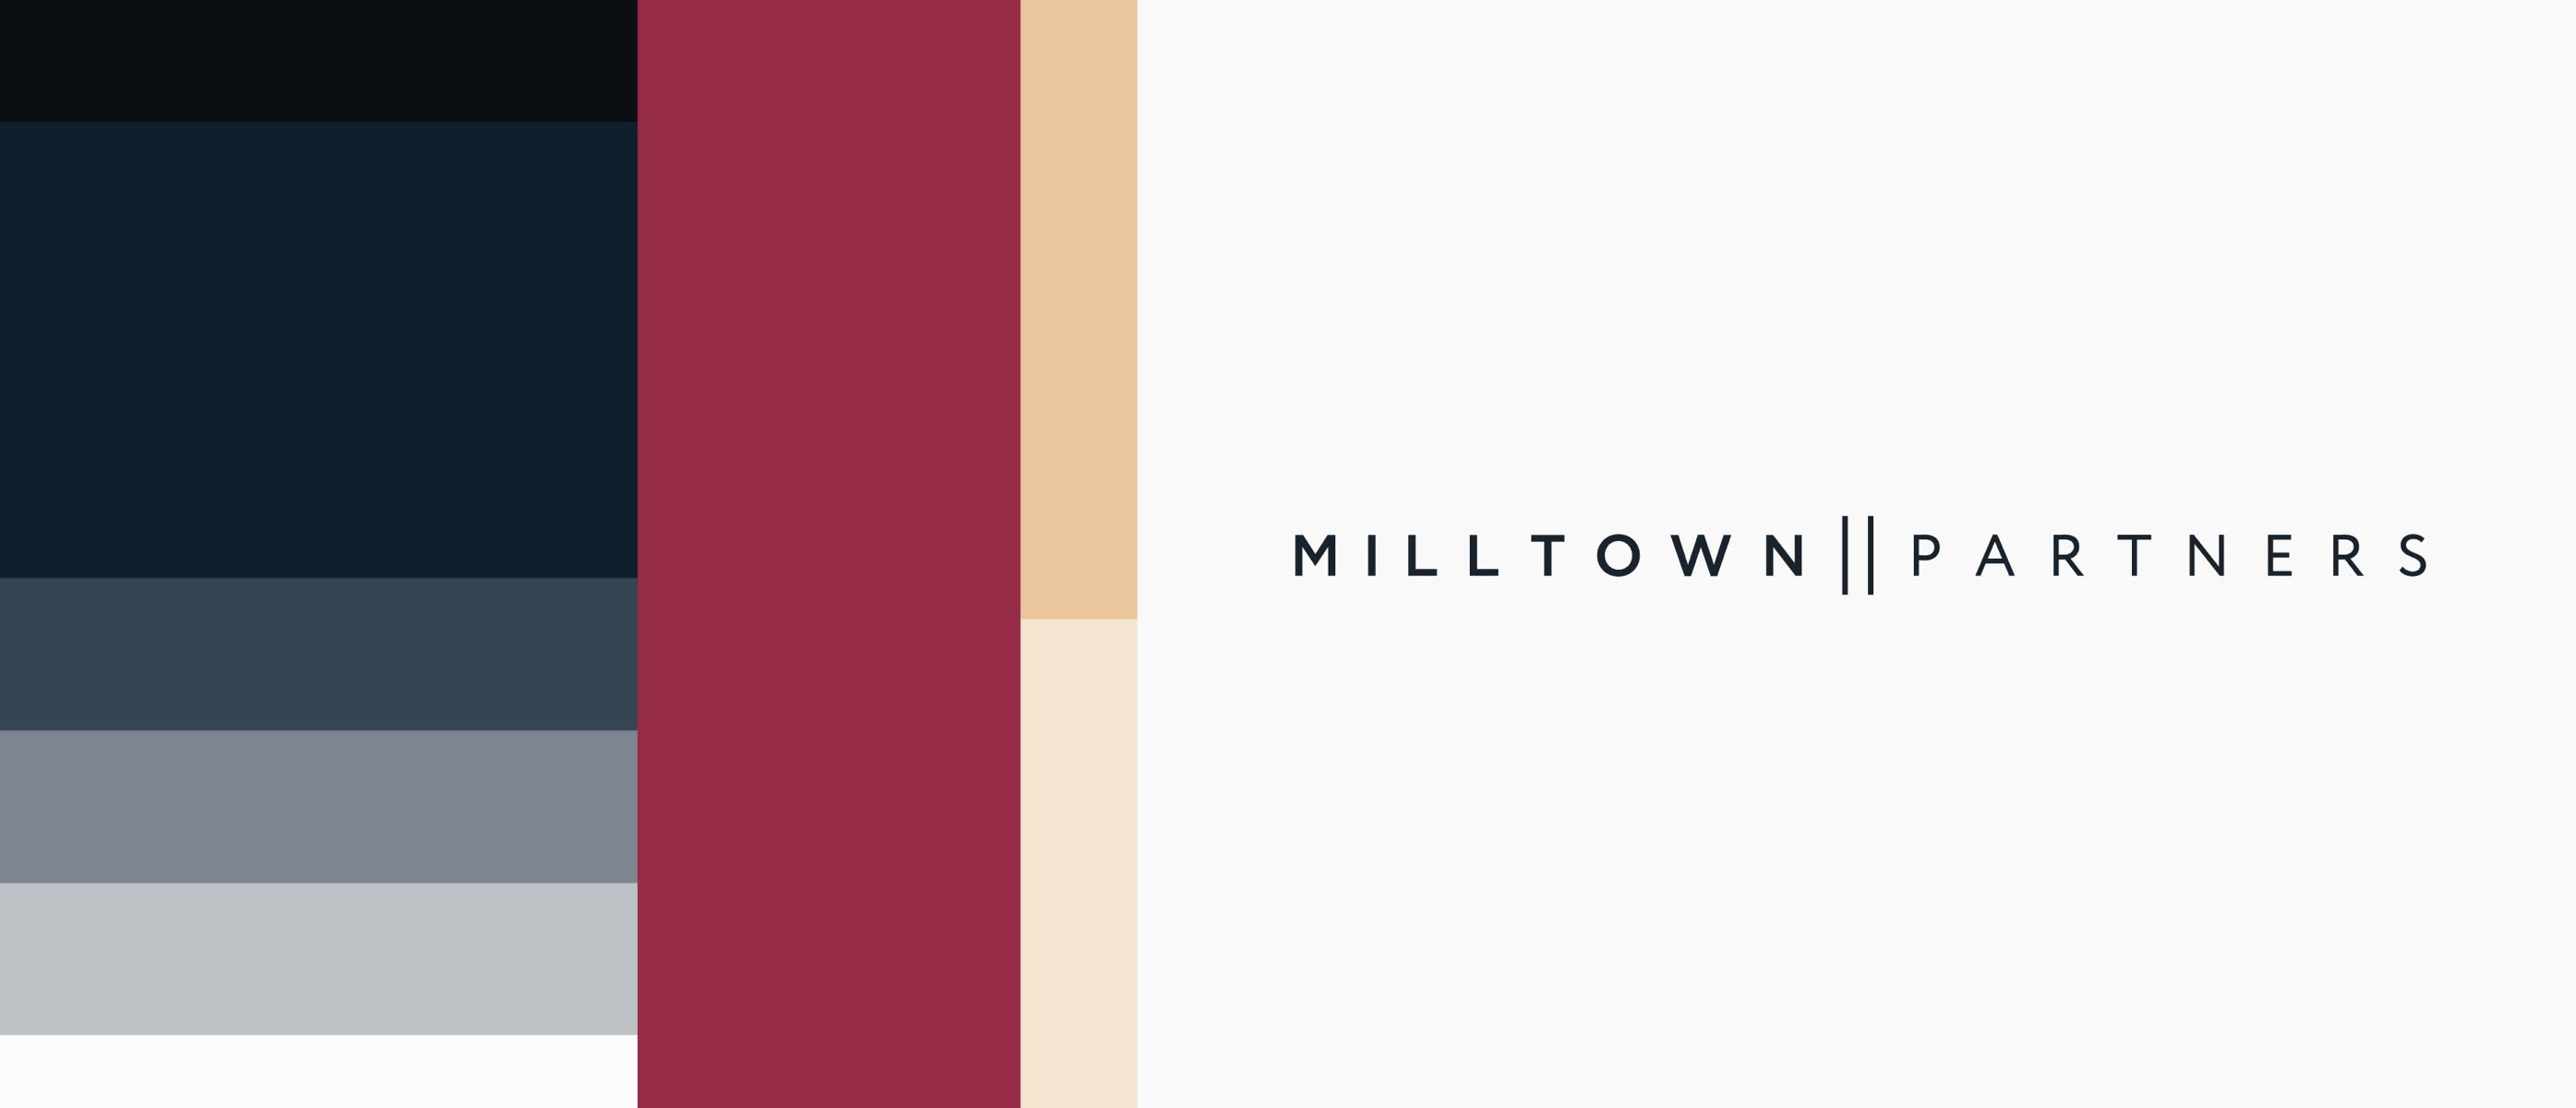 Milltown Partners